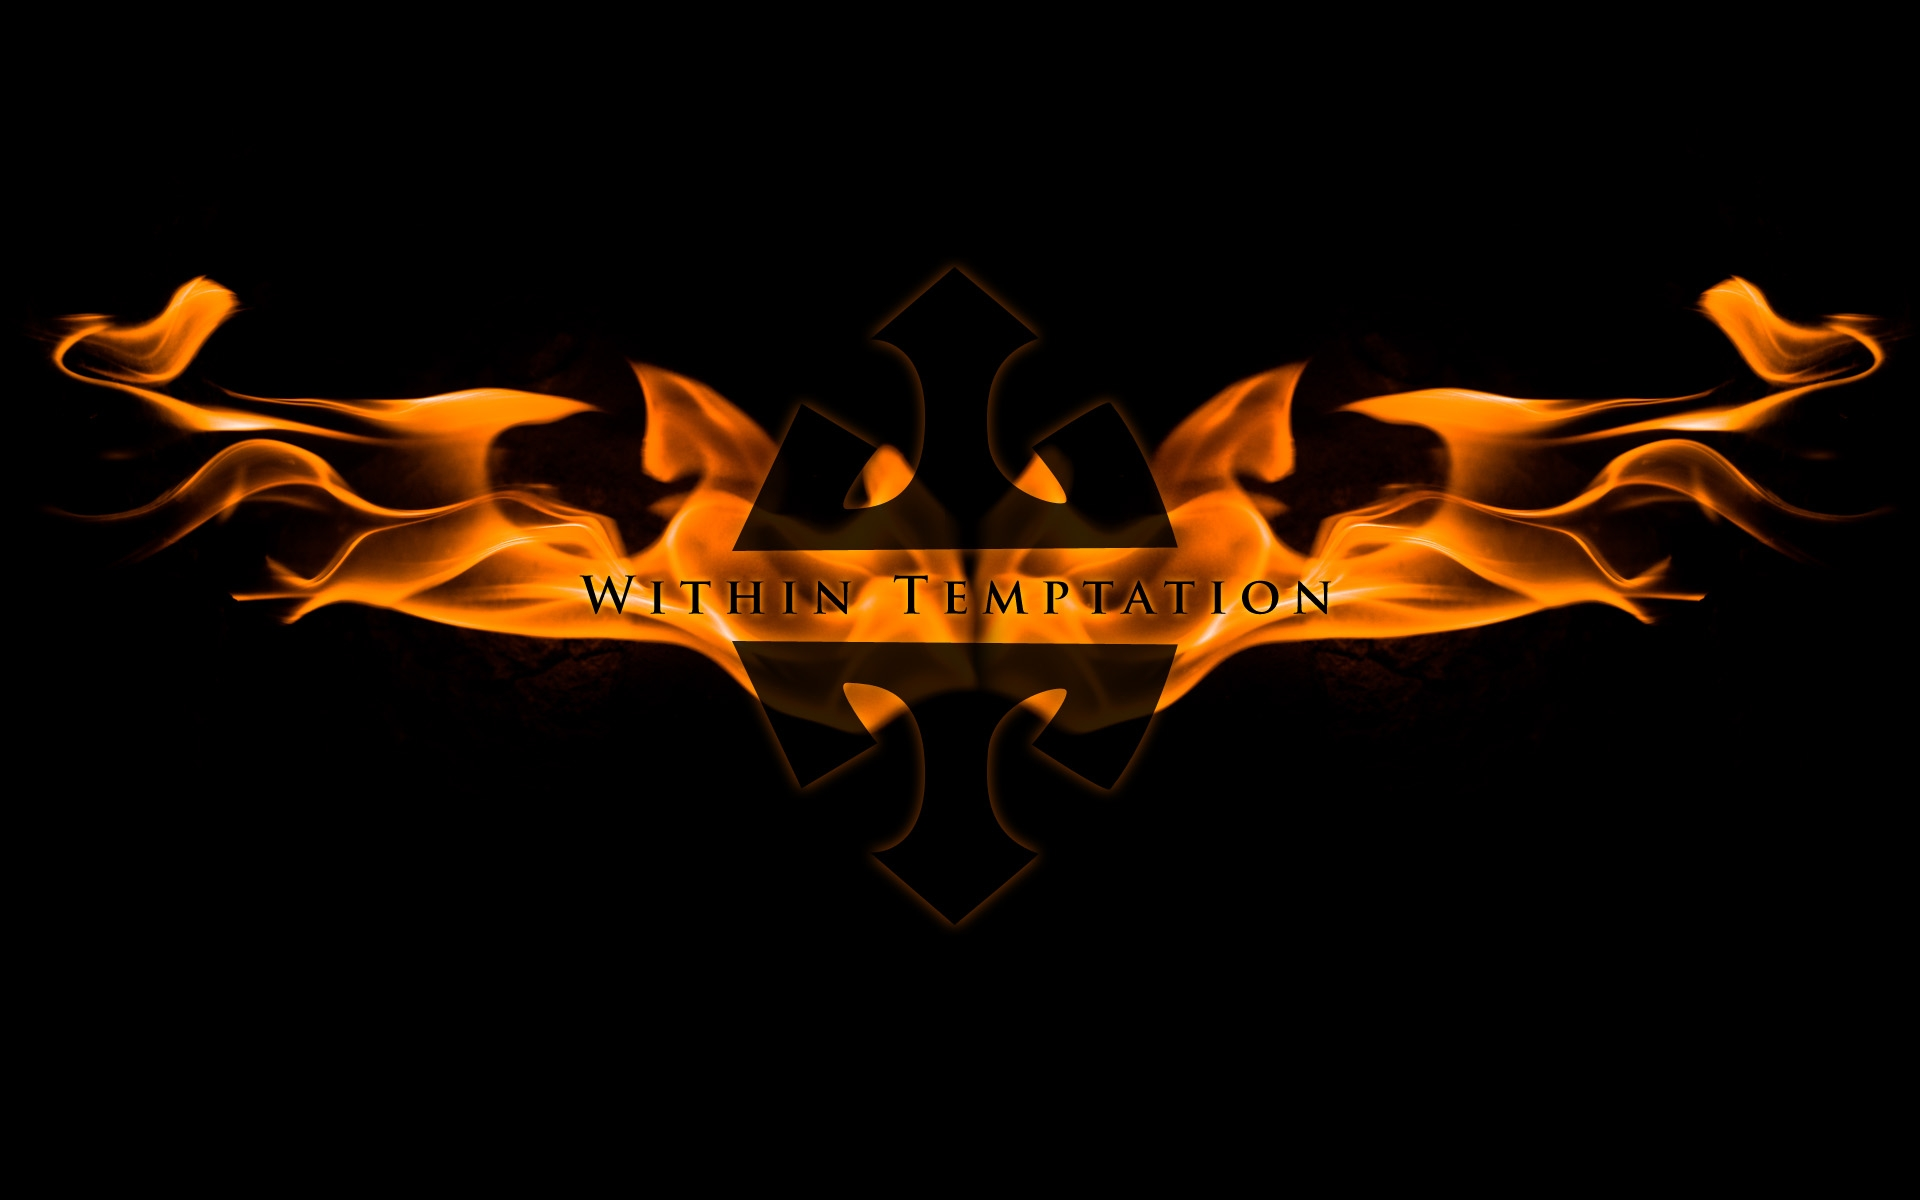 wallpaper logo graphic design